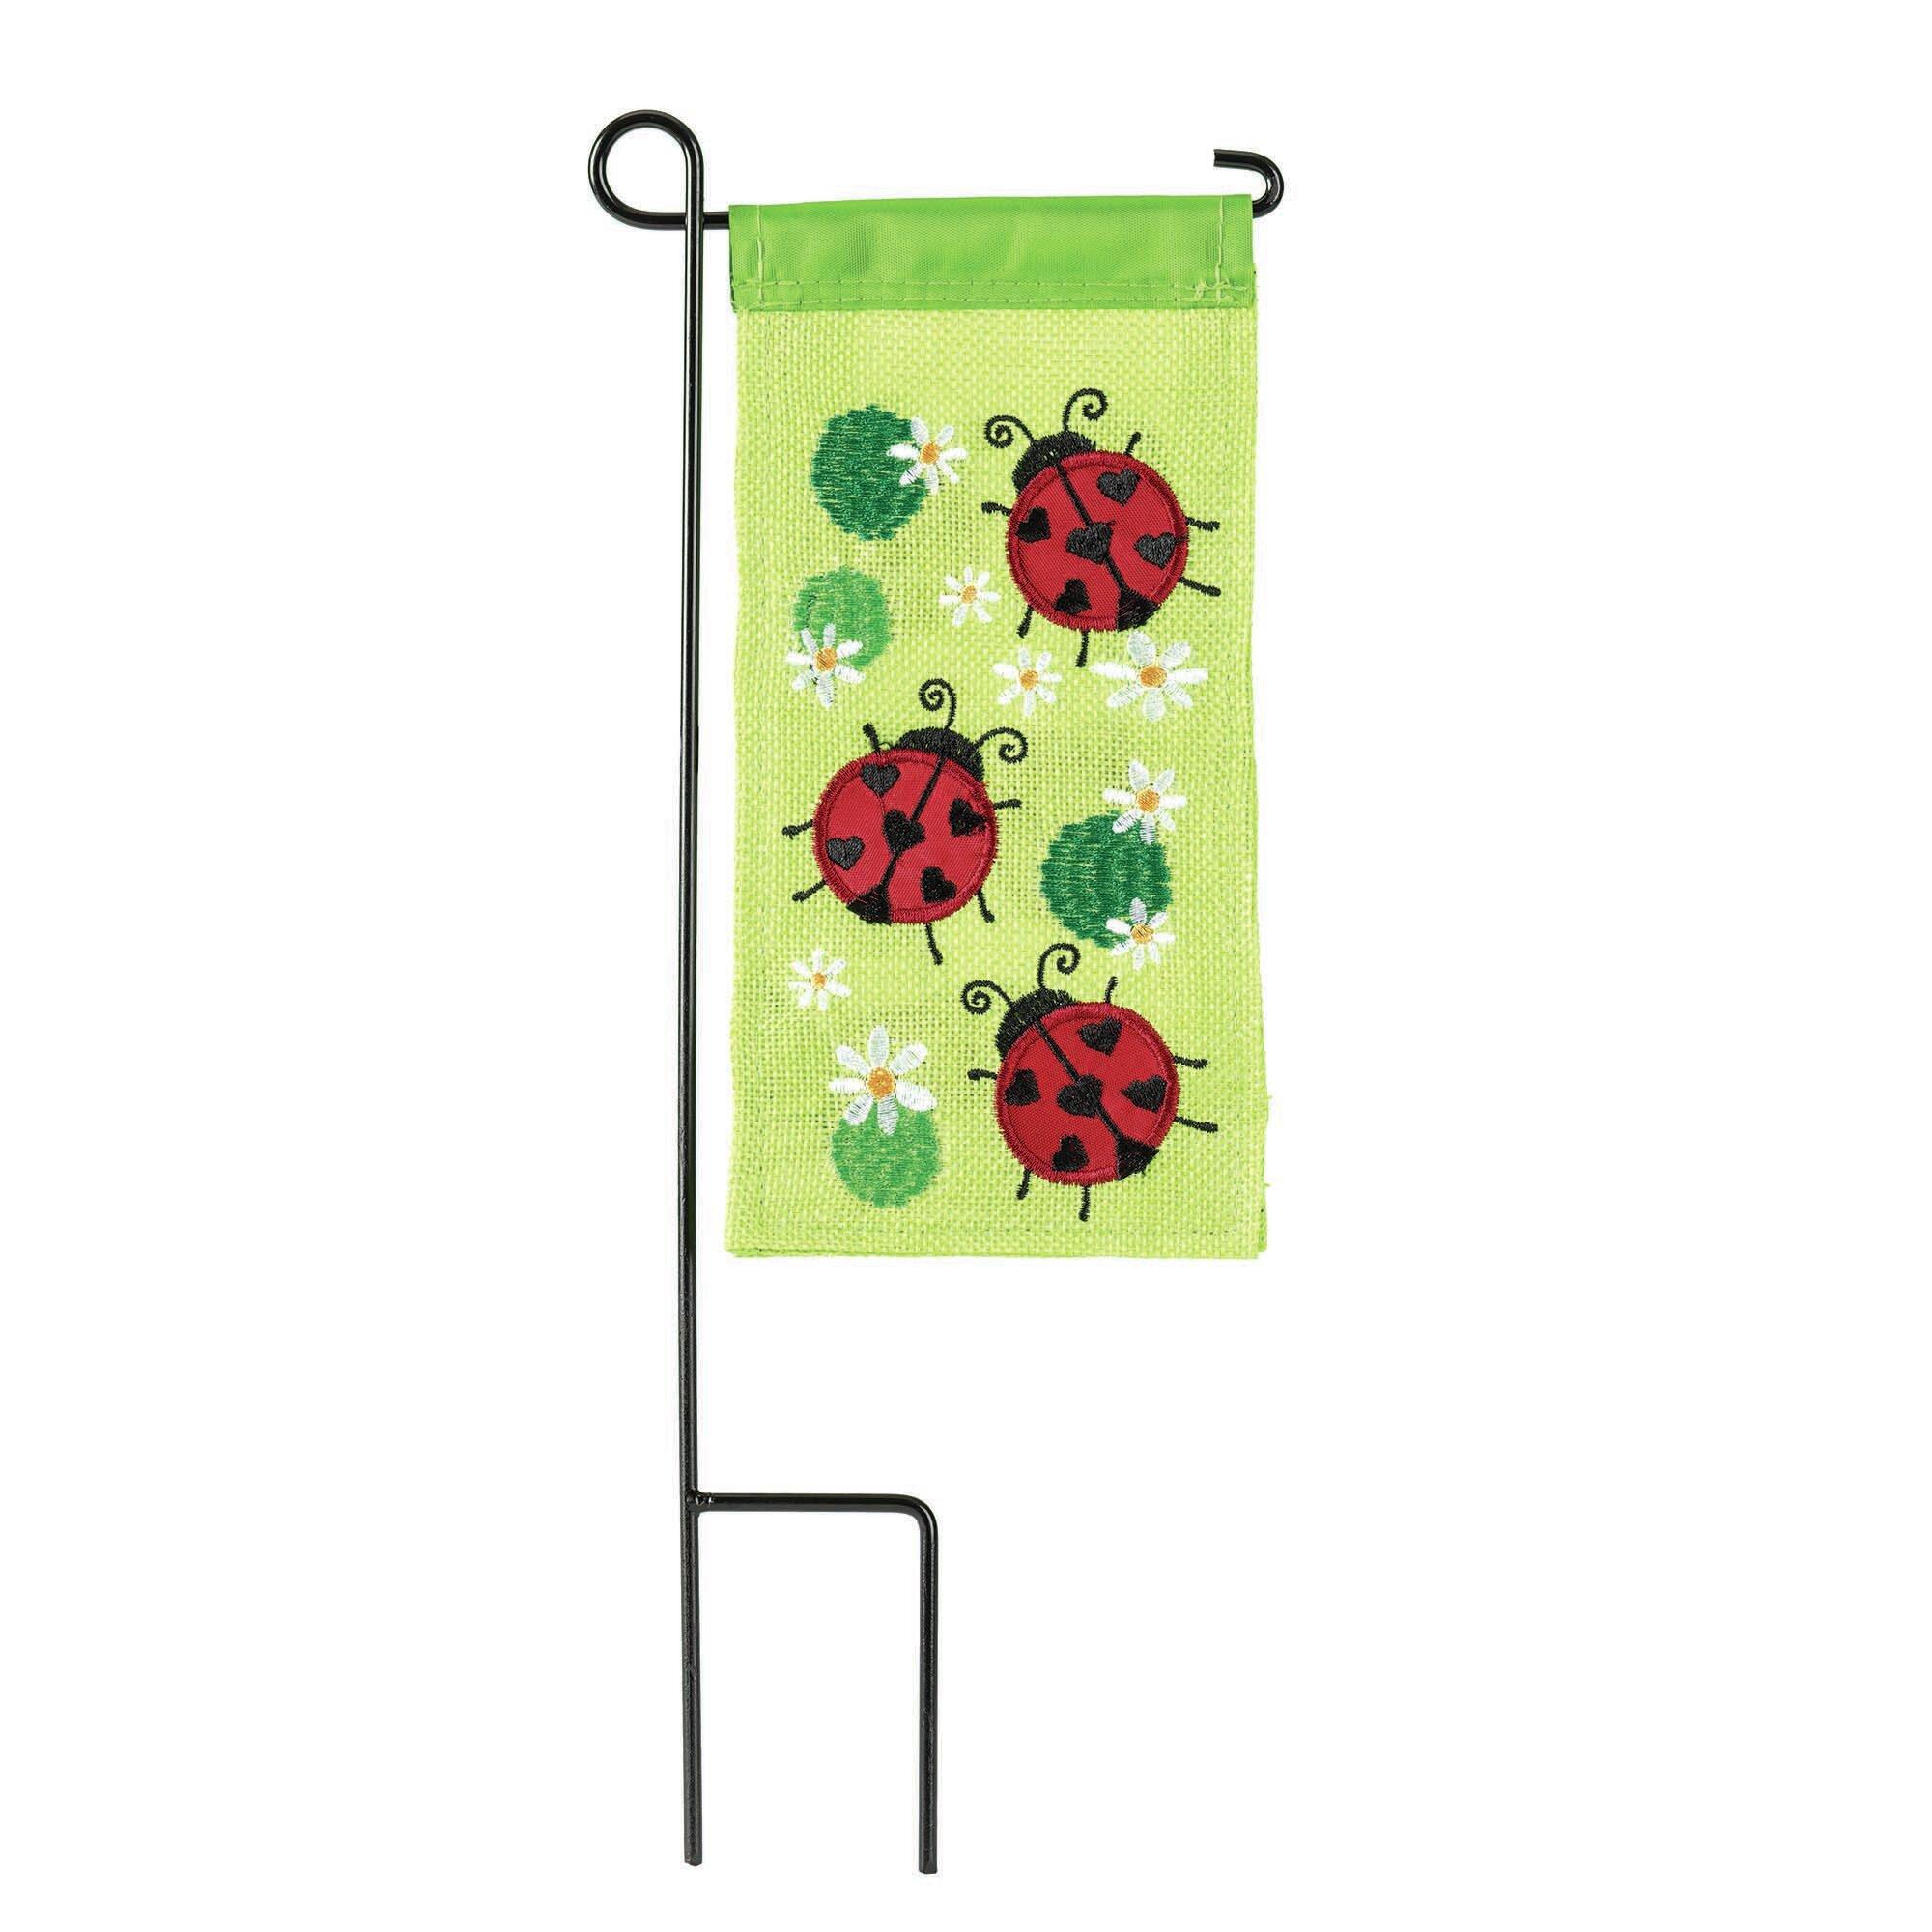 Arlmont Co Saxis Ladybugs Burlap 2 Sided Polyester 8 5 X 4 5 In Garden Flag Wayfair